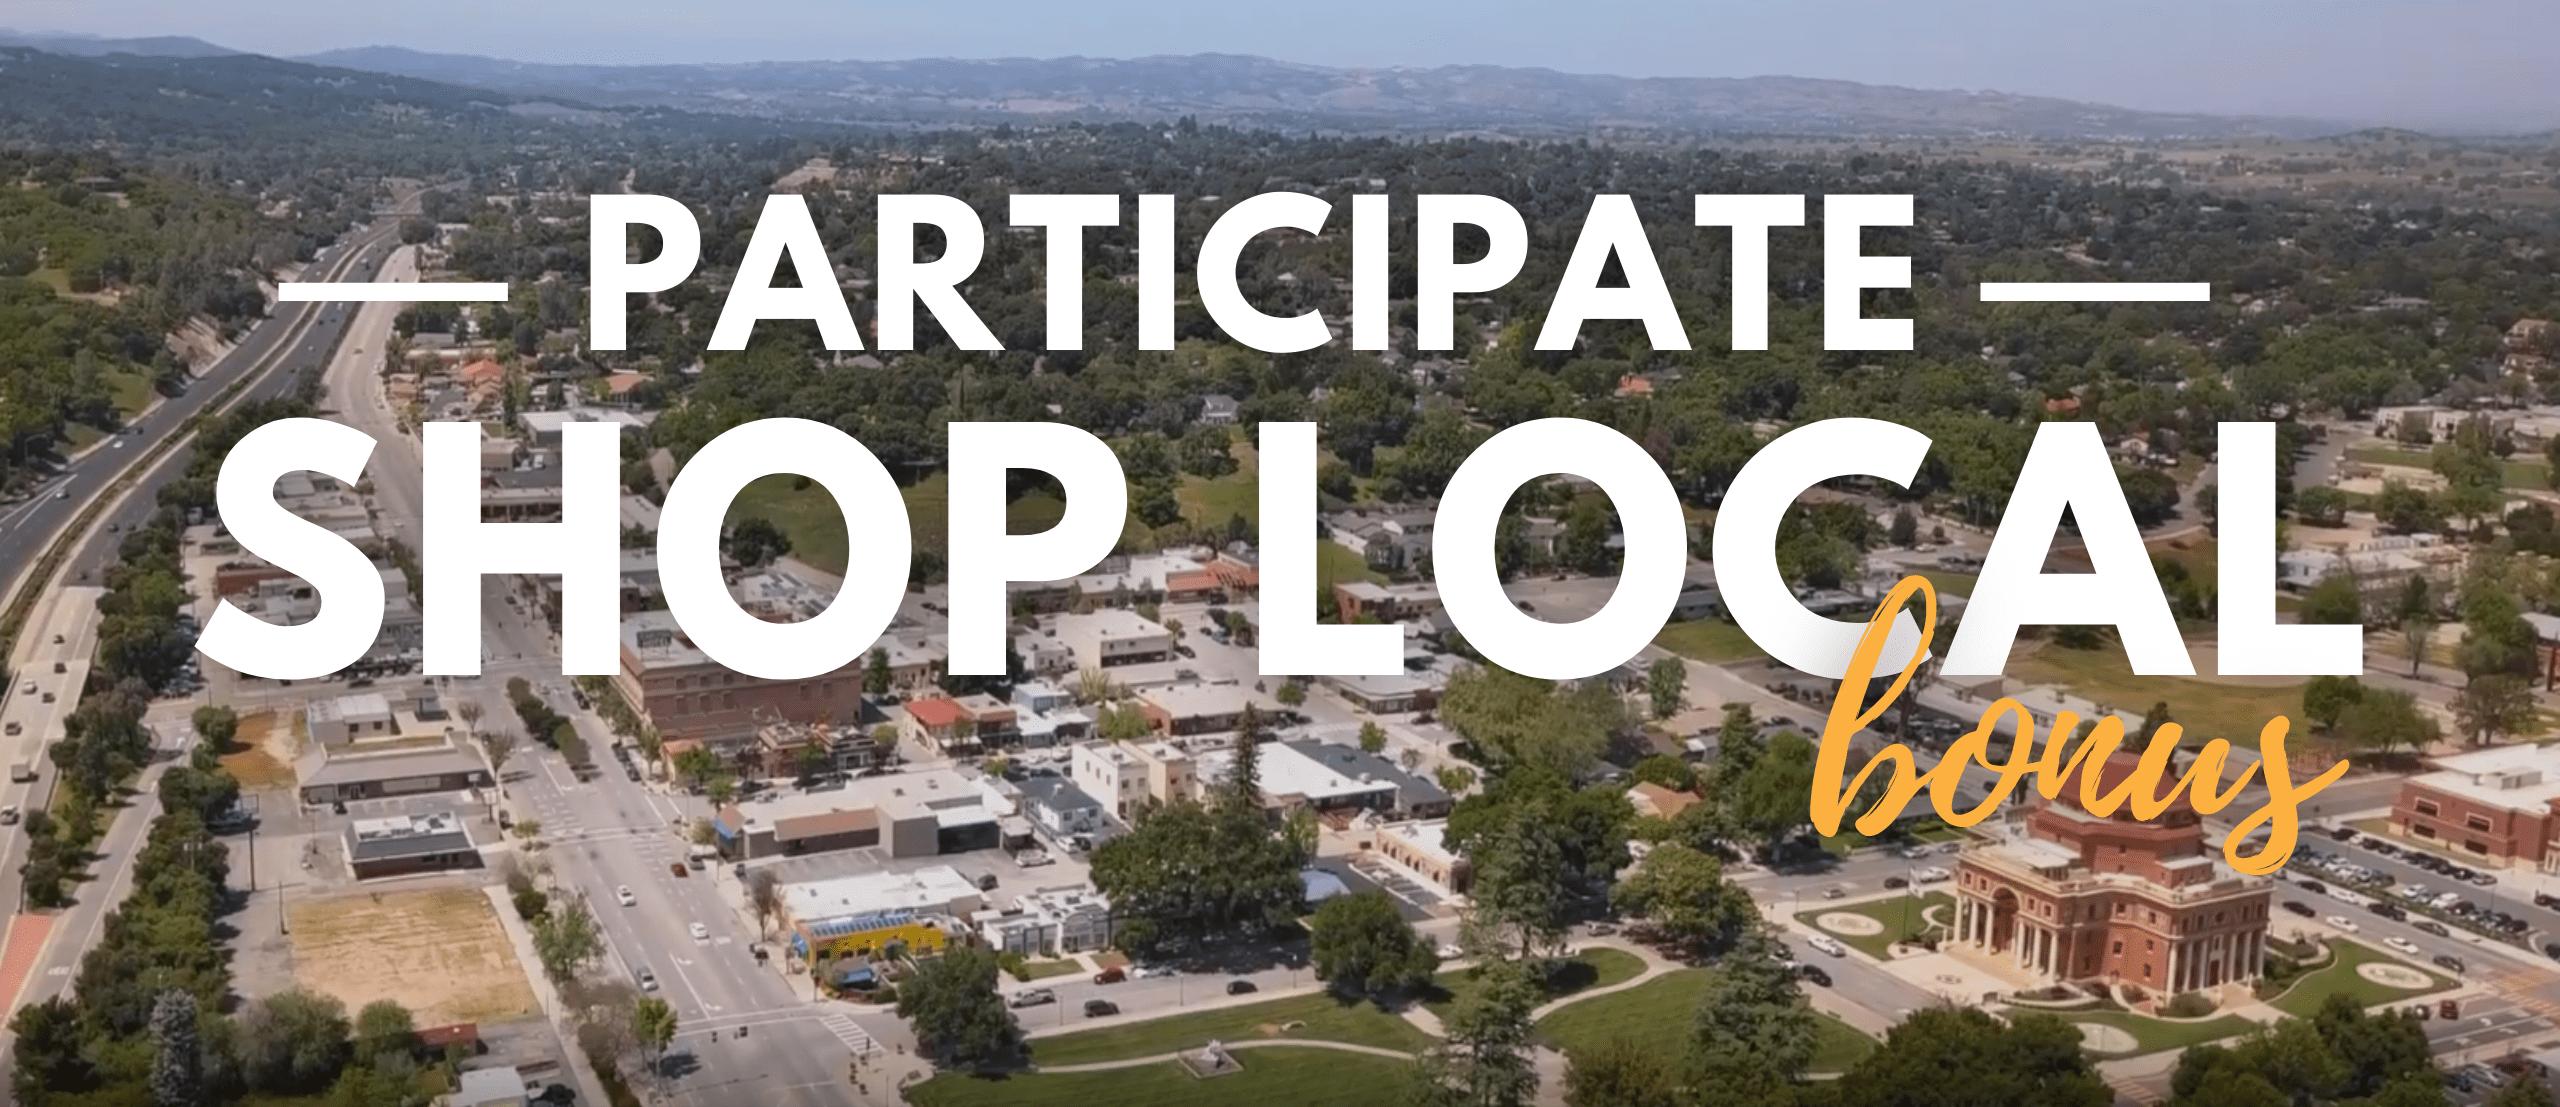 Businesses Participate Shop Local Program